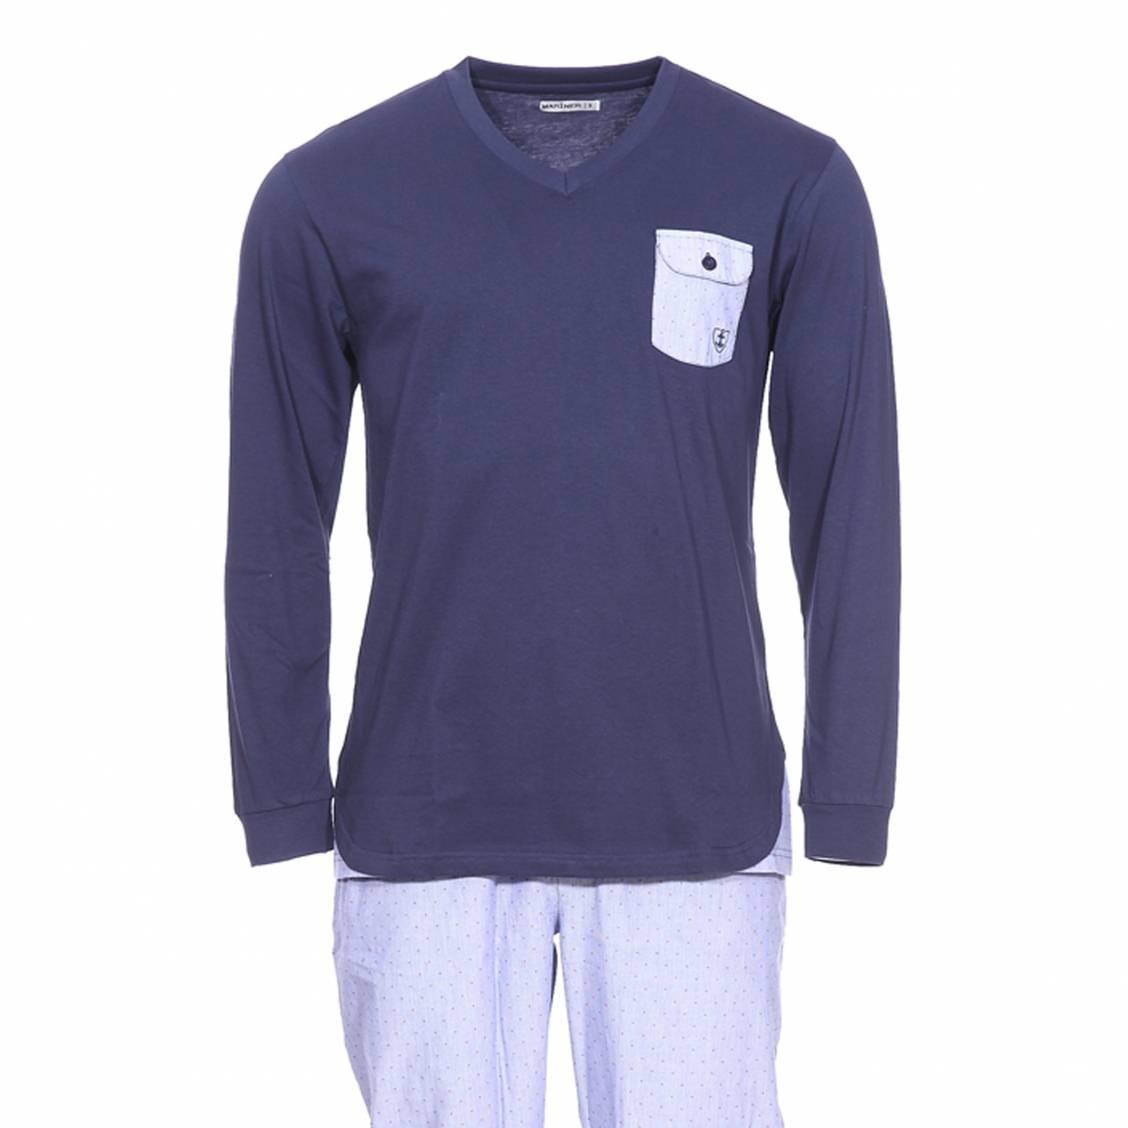 06261ec2a7a04 Pyjama long Mariner bi-matière   tee-shirt manches longues col v en jersey  de coton bleu marine et pantalon en popeline de coton à à rayures bleu avec  ...